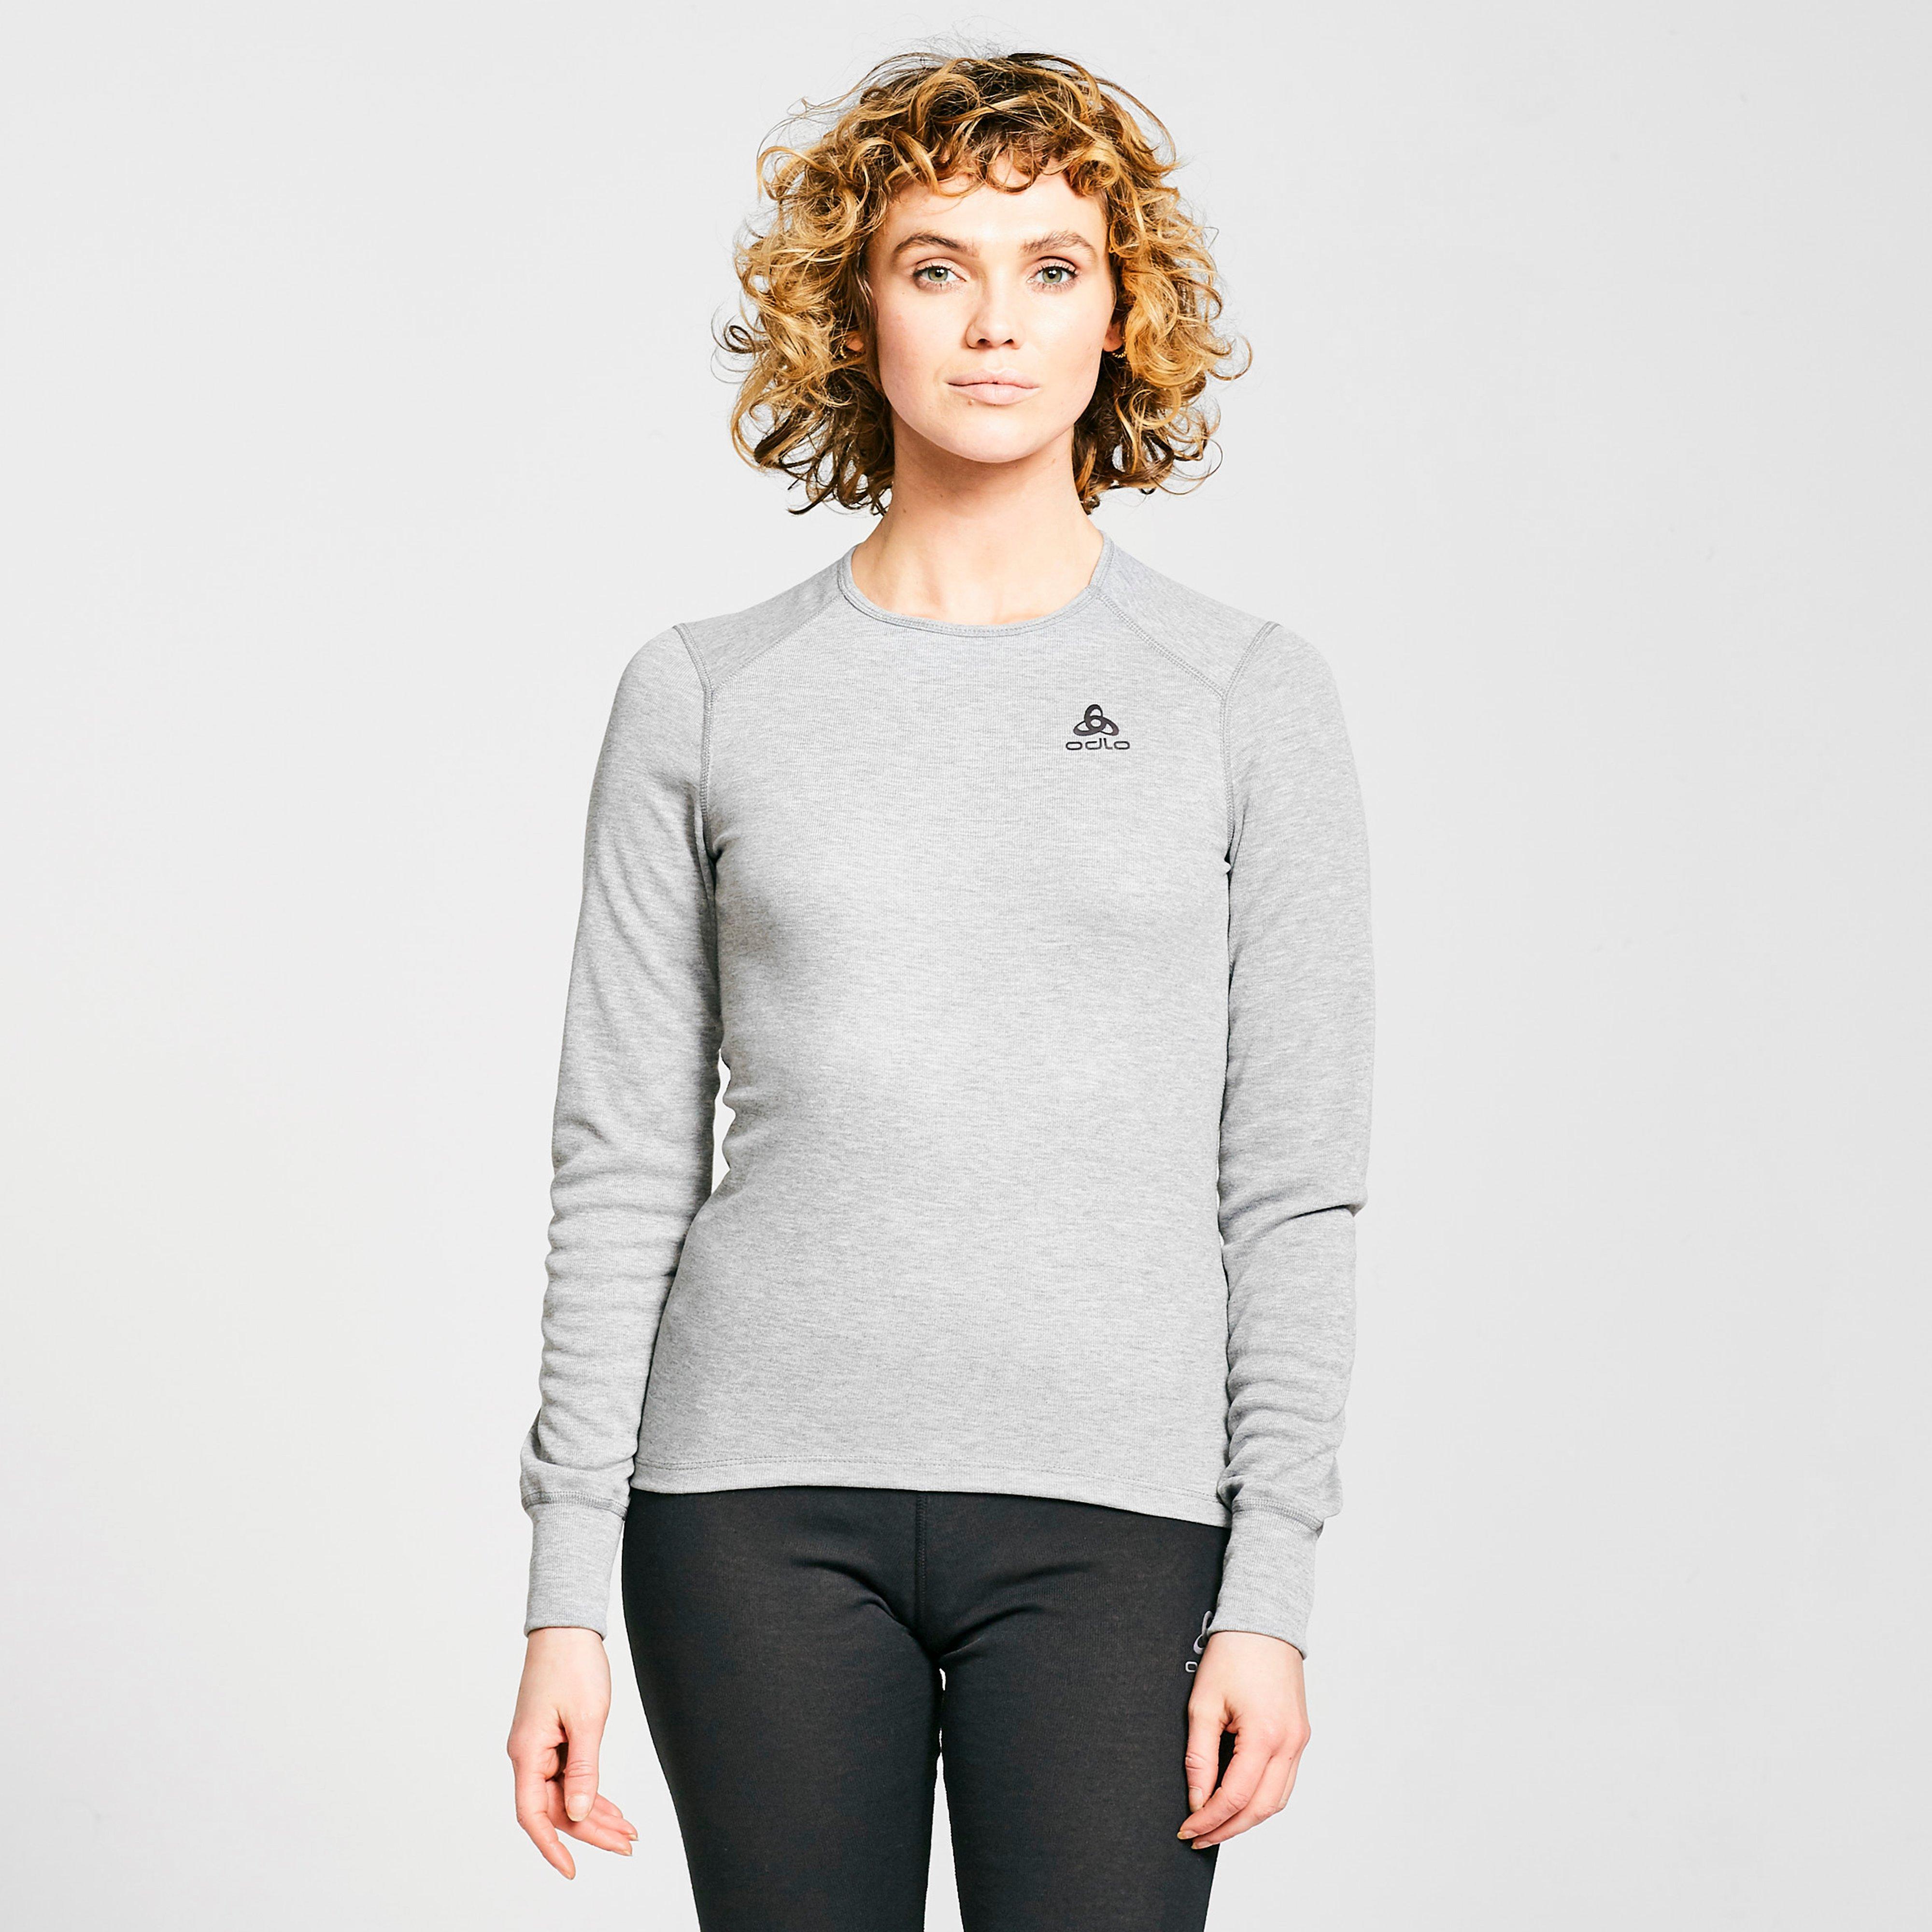 Odlo Women's Active Warm Eco Long-Sleeve Baselayer Top - Grey, Grey